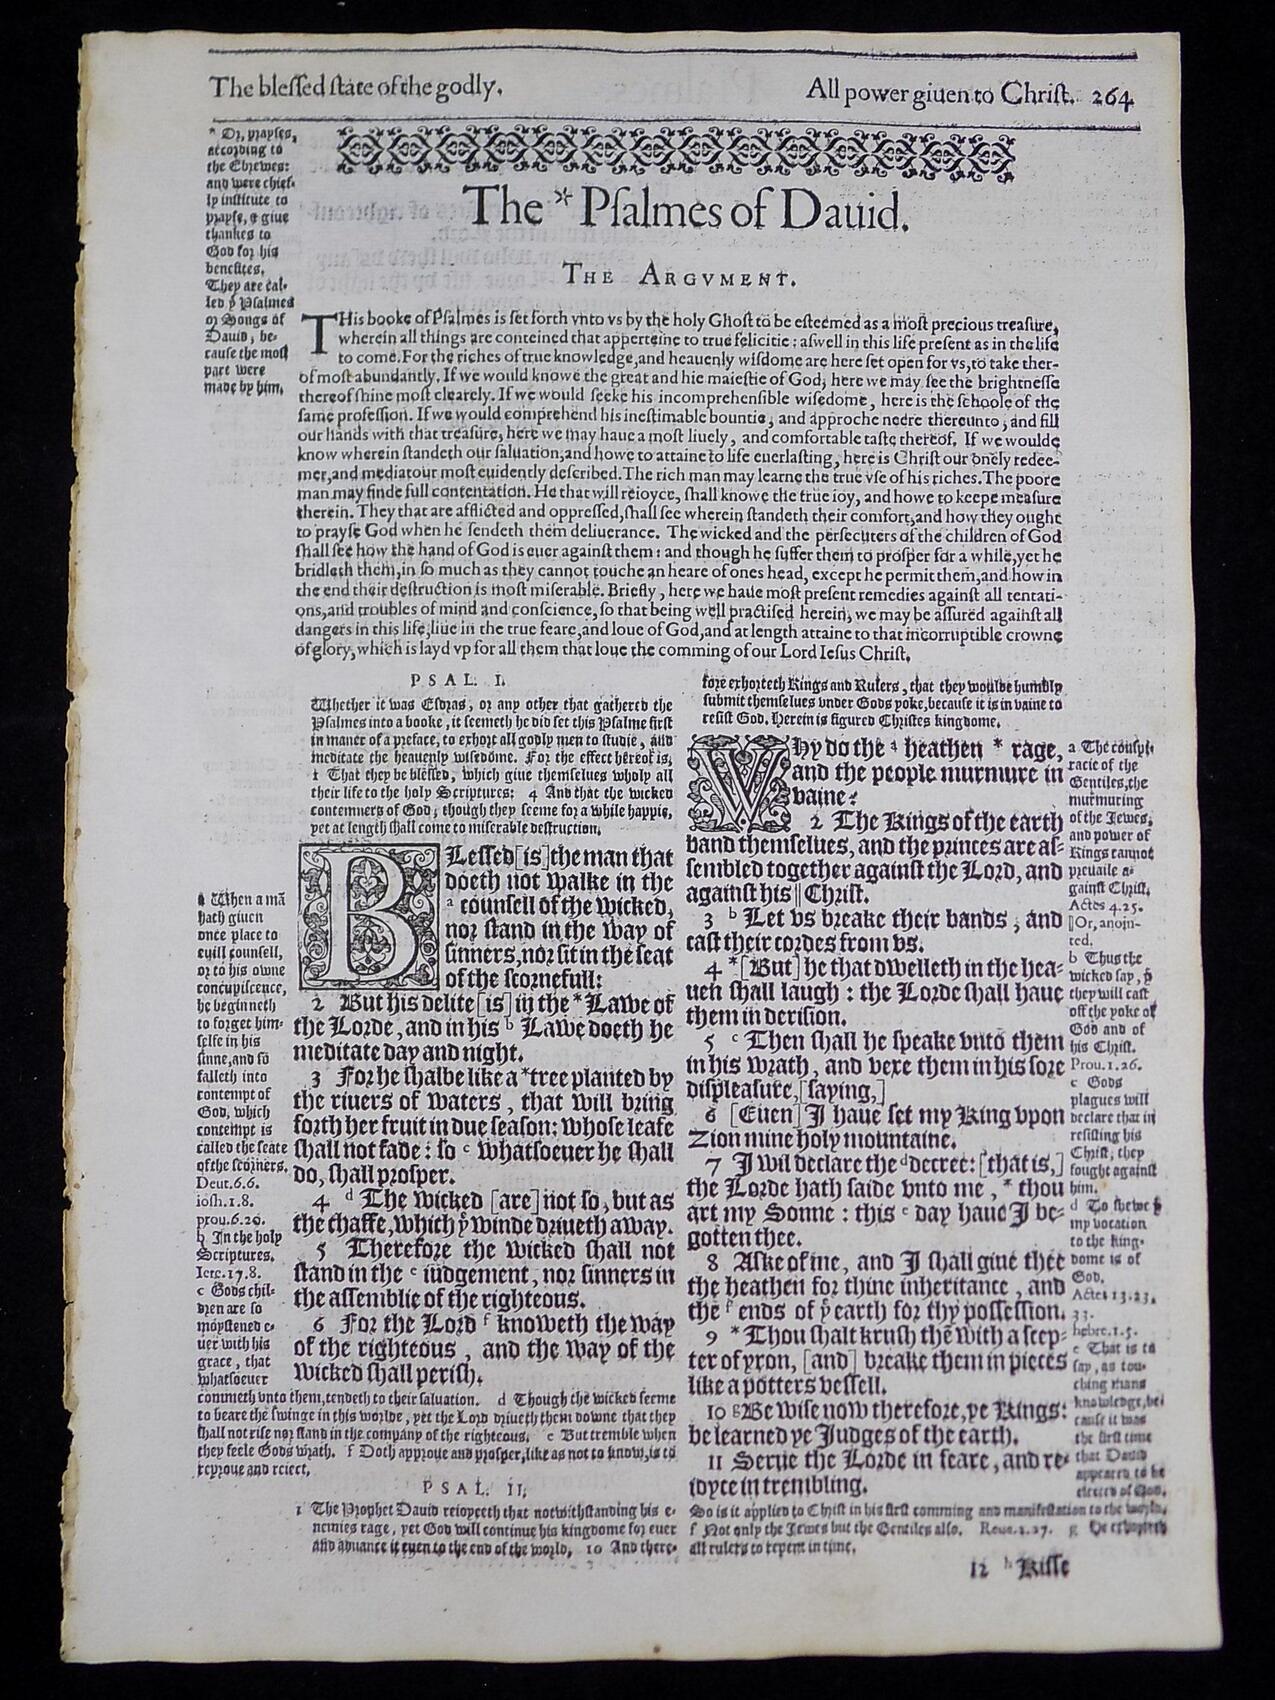 1583 GENEVA BIBLE LEAF BOOK OF PSALMS